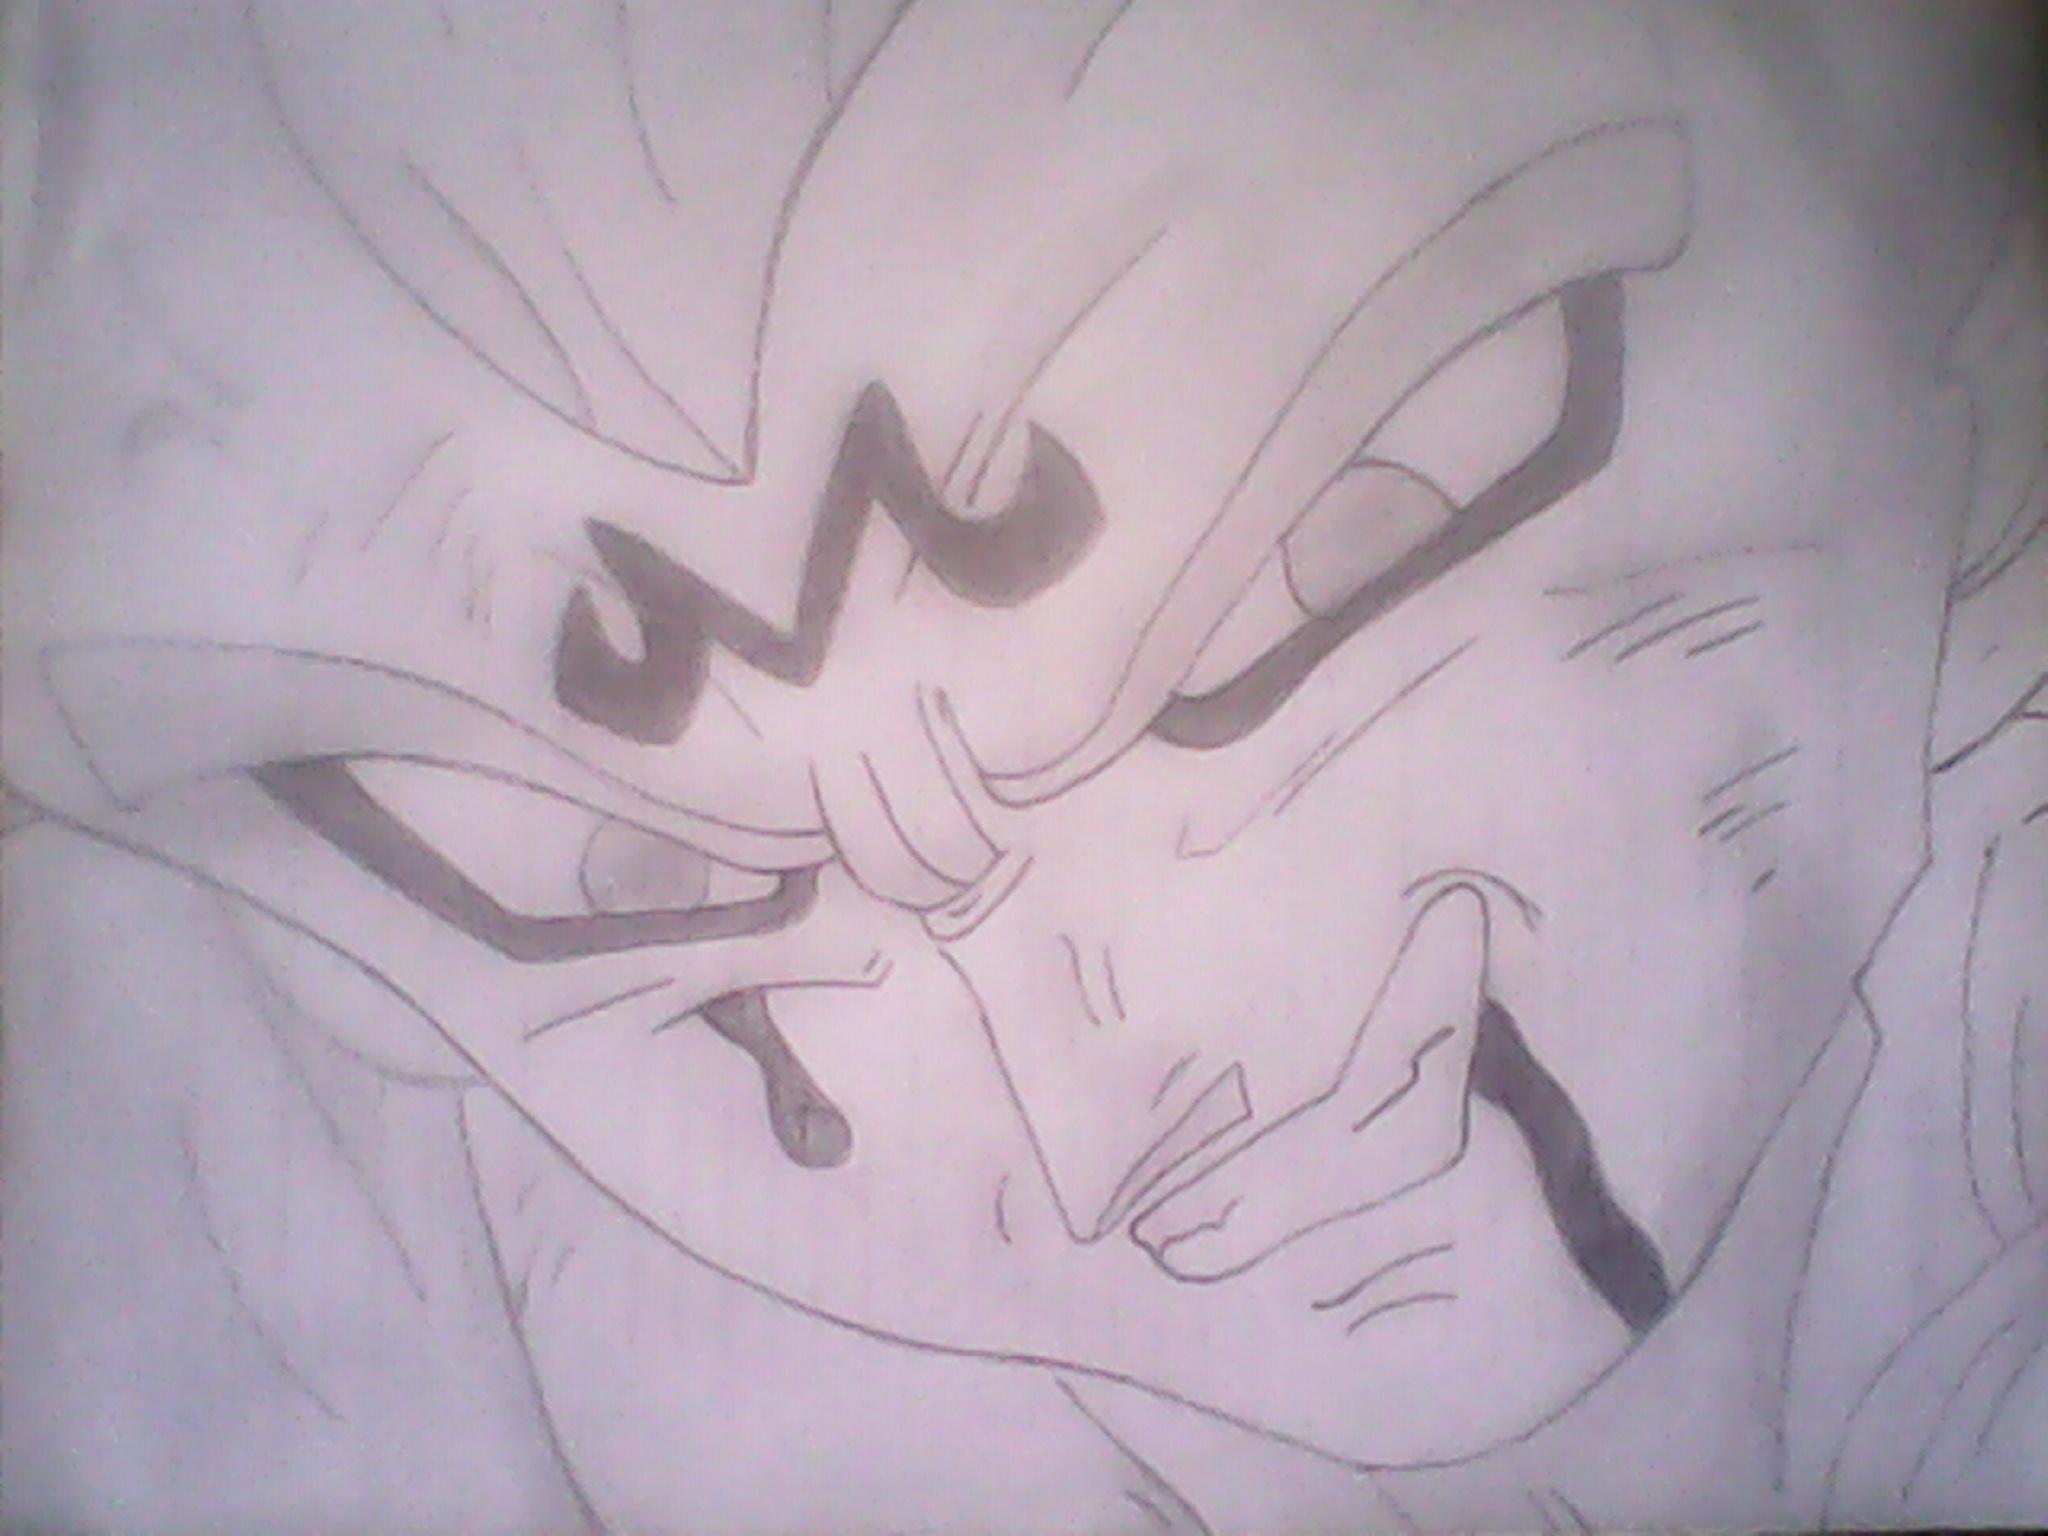 2048x1536 Dibujo De Vegeta Dragon Ball Z Majin Vegeta Dibujos